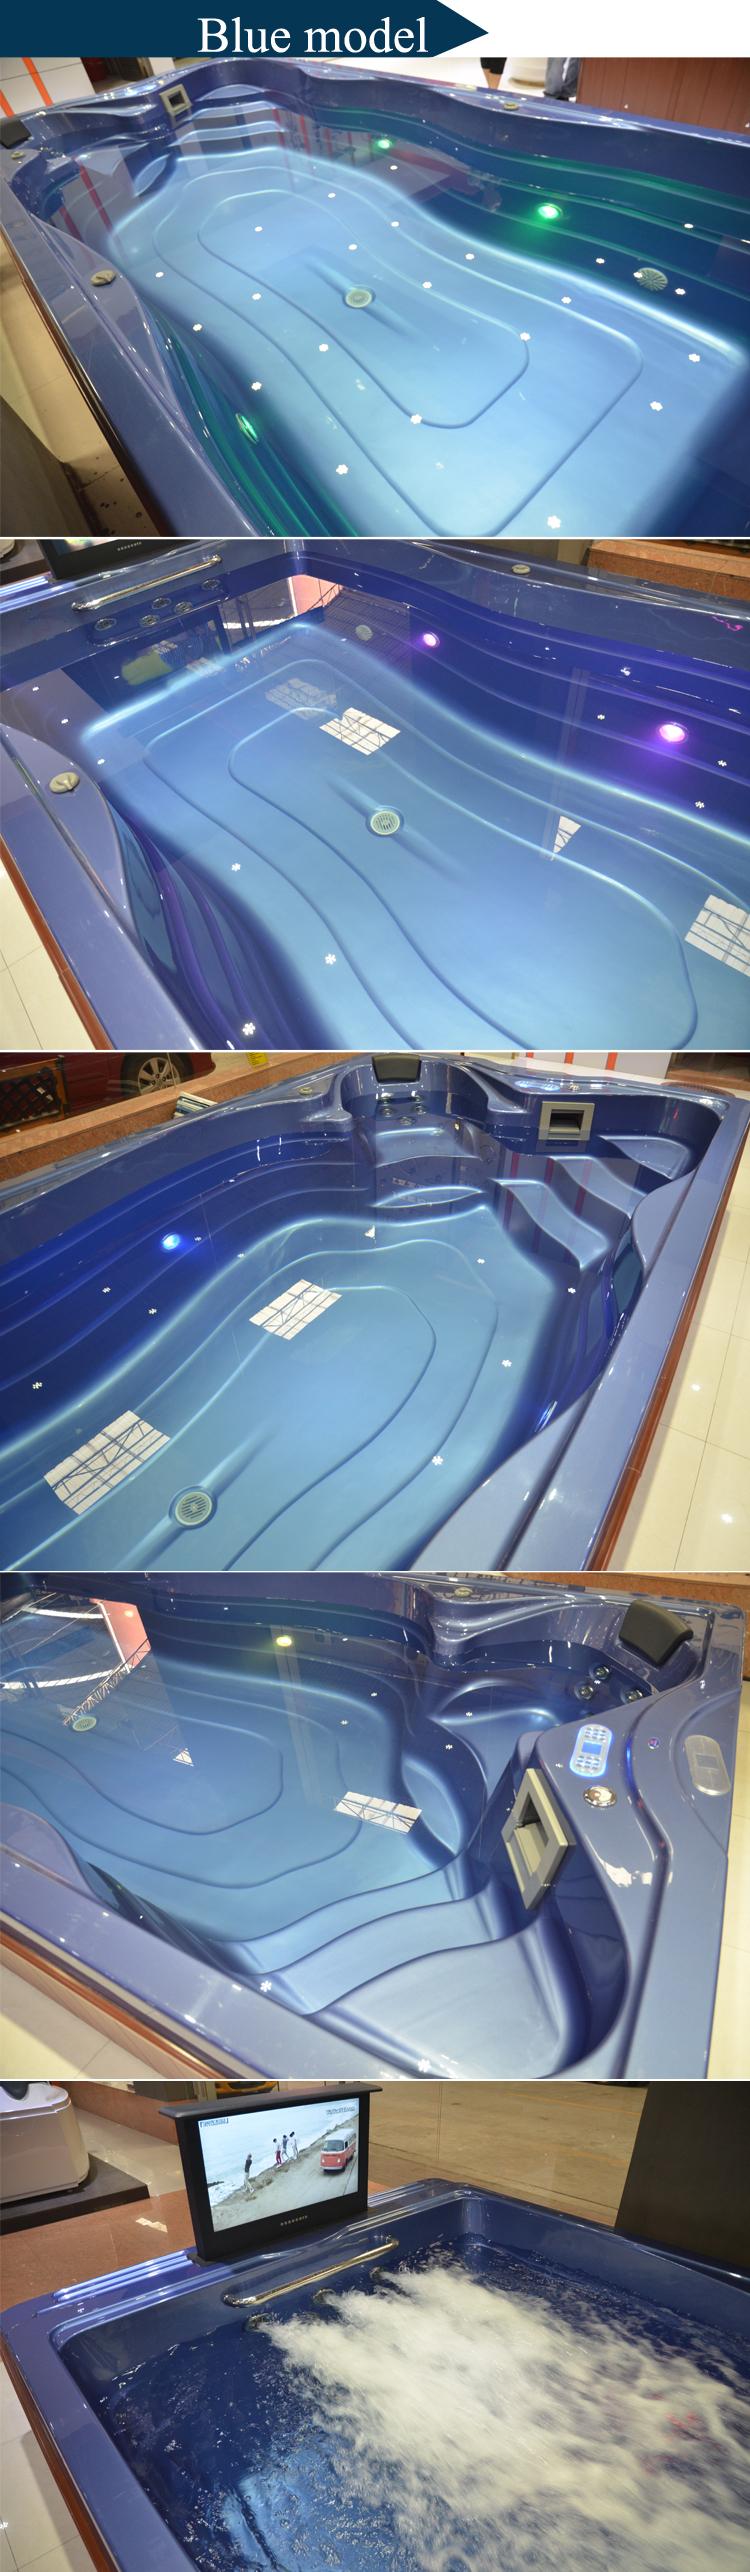 Hs-k609 4.8m Length Fiberglass Hot Tubs Outdoor Big Swimming Pool ...